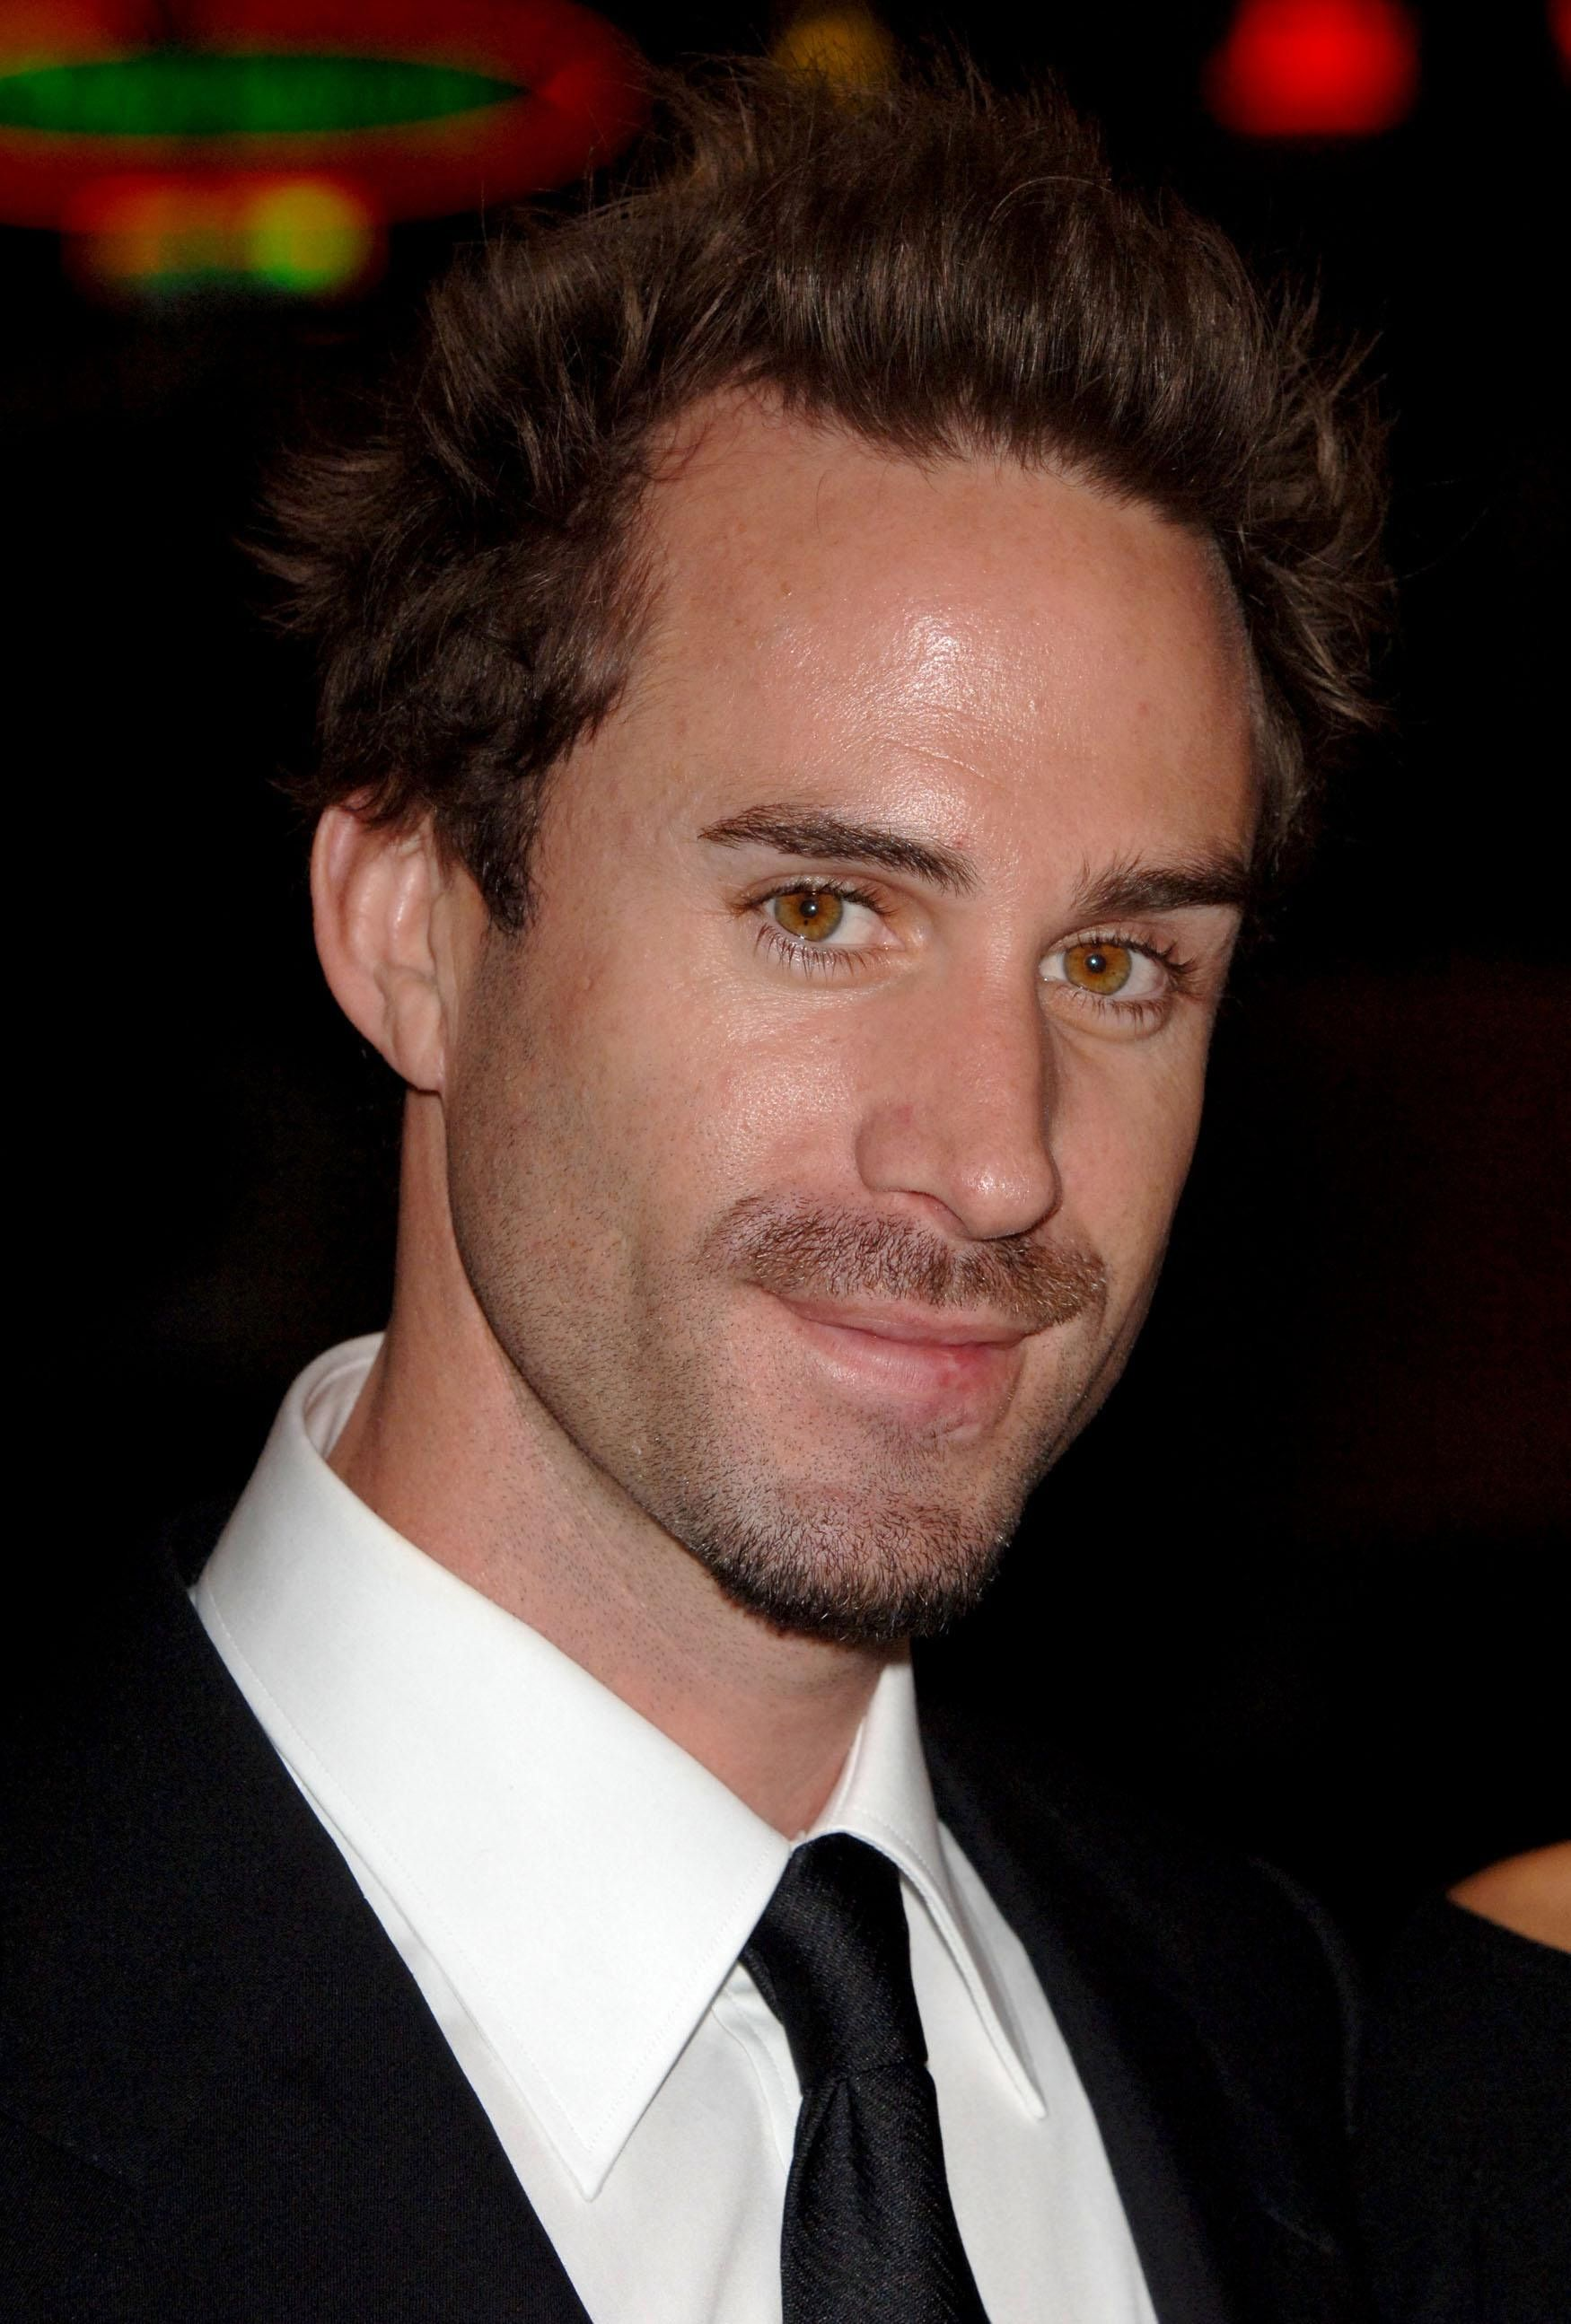 Joseph Fiennes (born 1970)